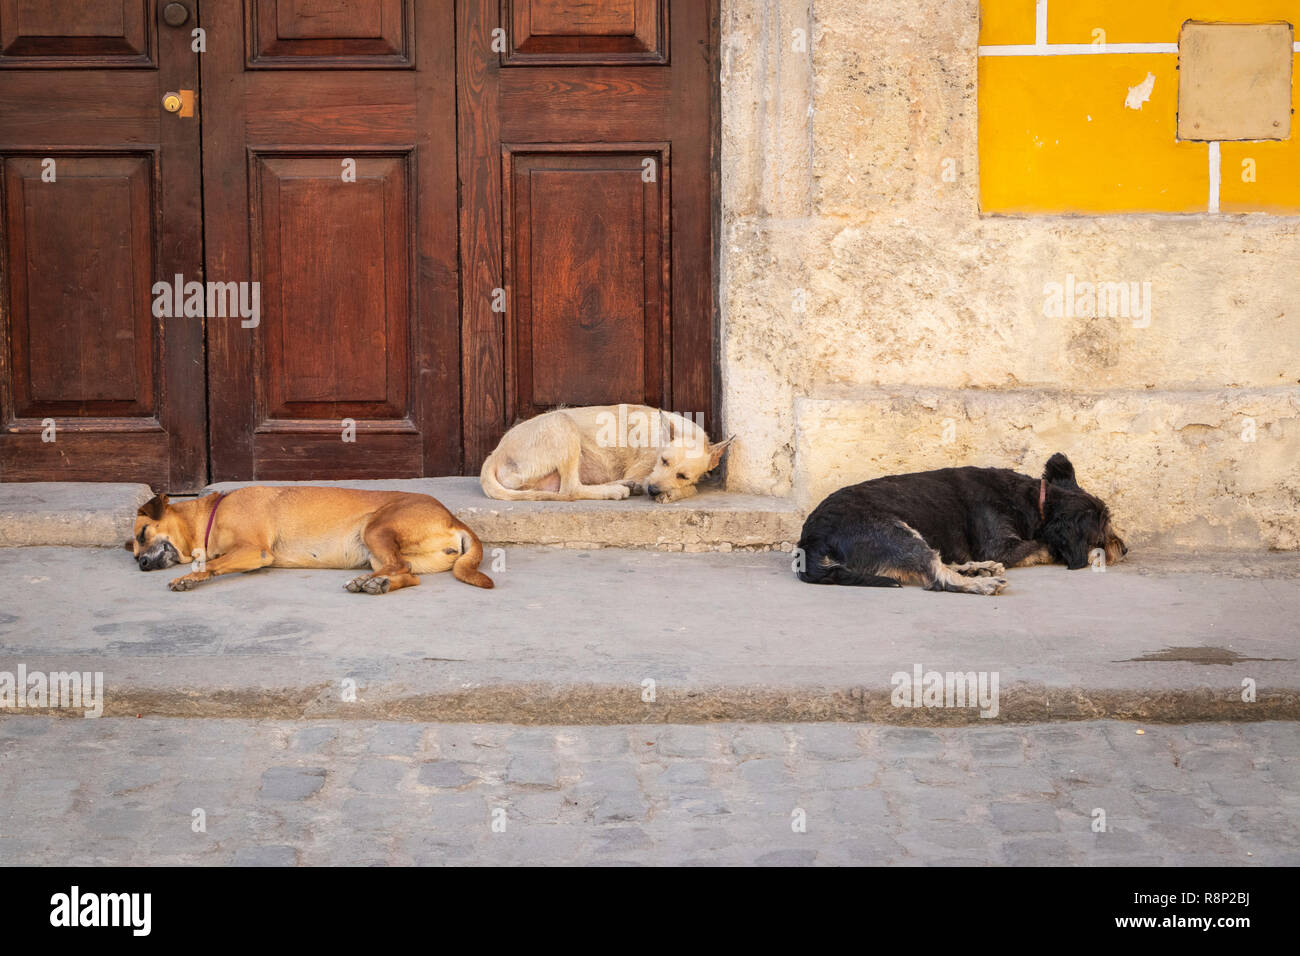 3 dogs sleeping in the heat of the day in Havana Cuba - Stock Image